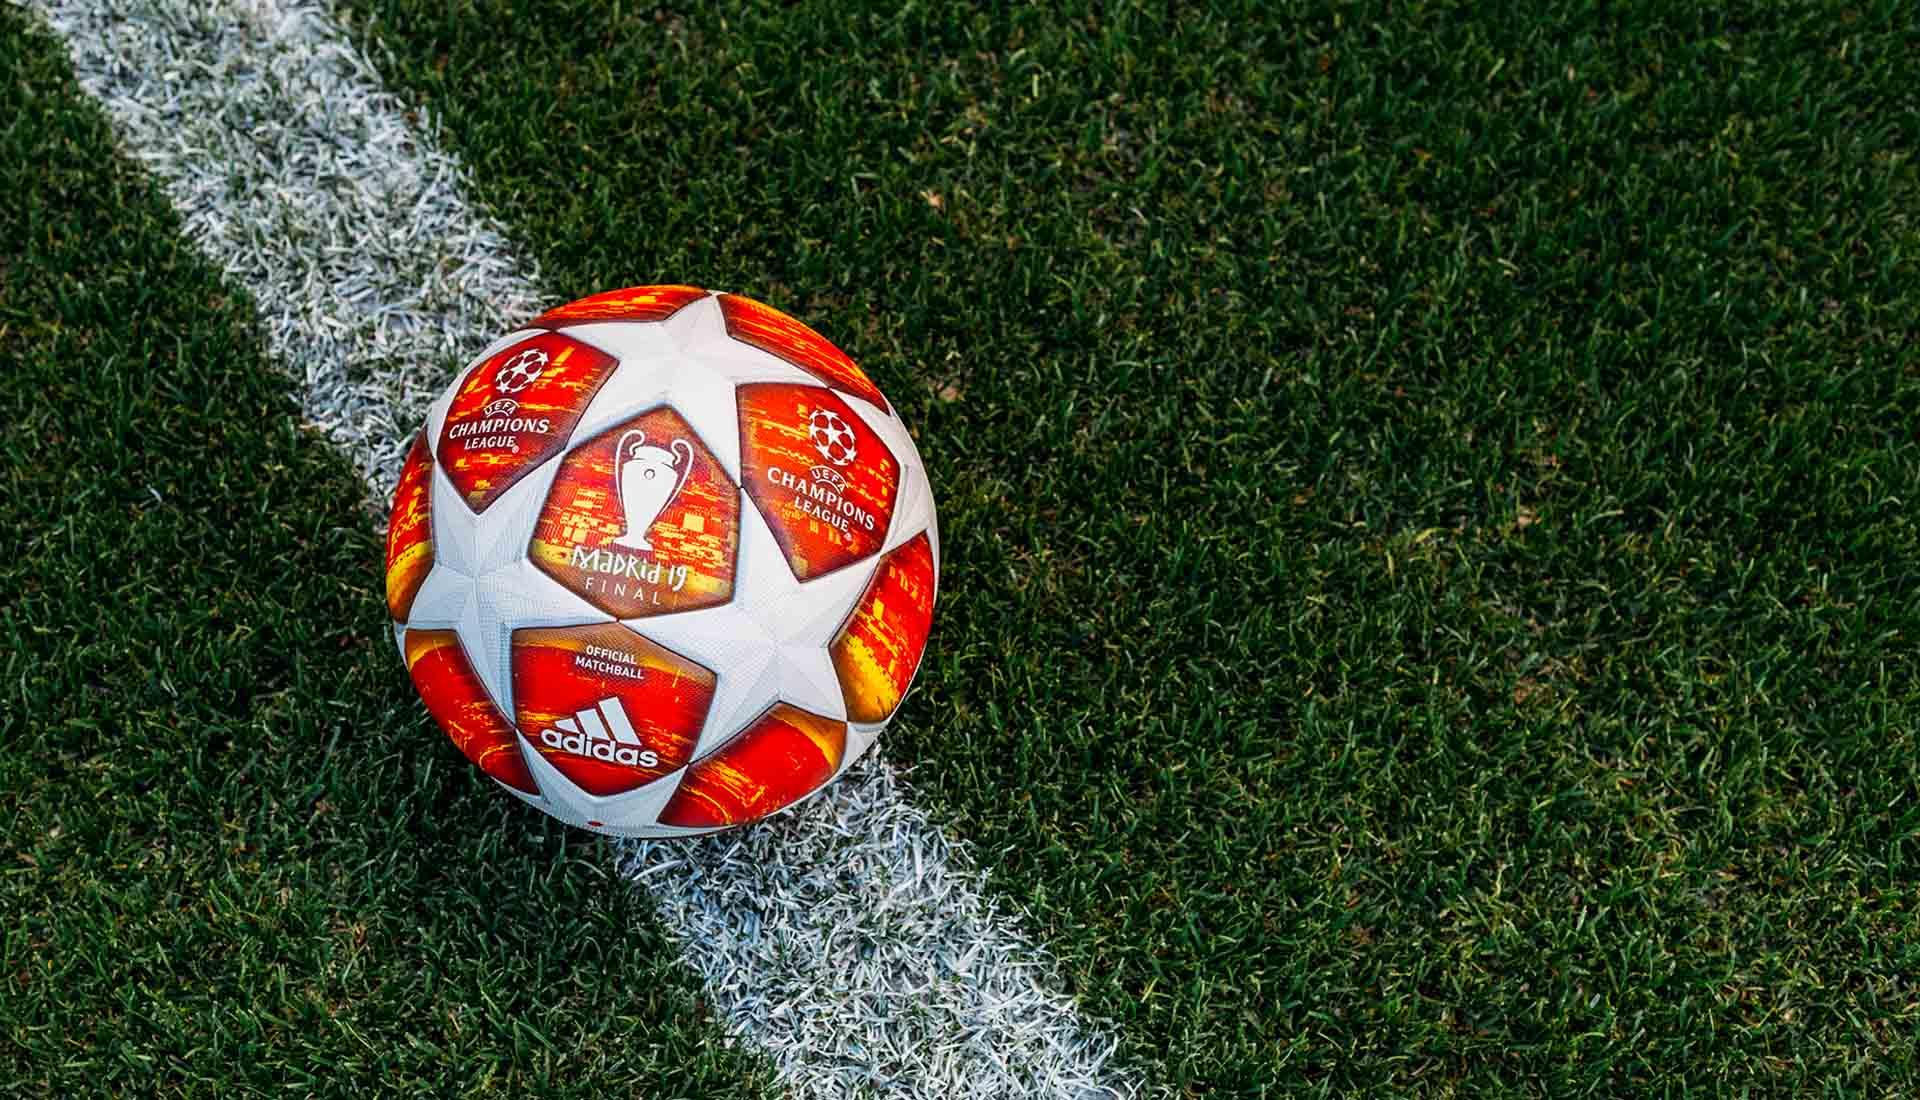 poetas Curso de colisión Carnicero  adidas Unveil The 2019 UCL Finale Match Ball - SoccerBible